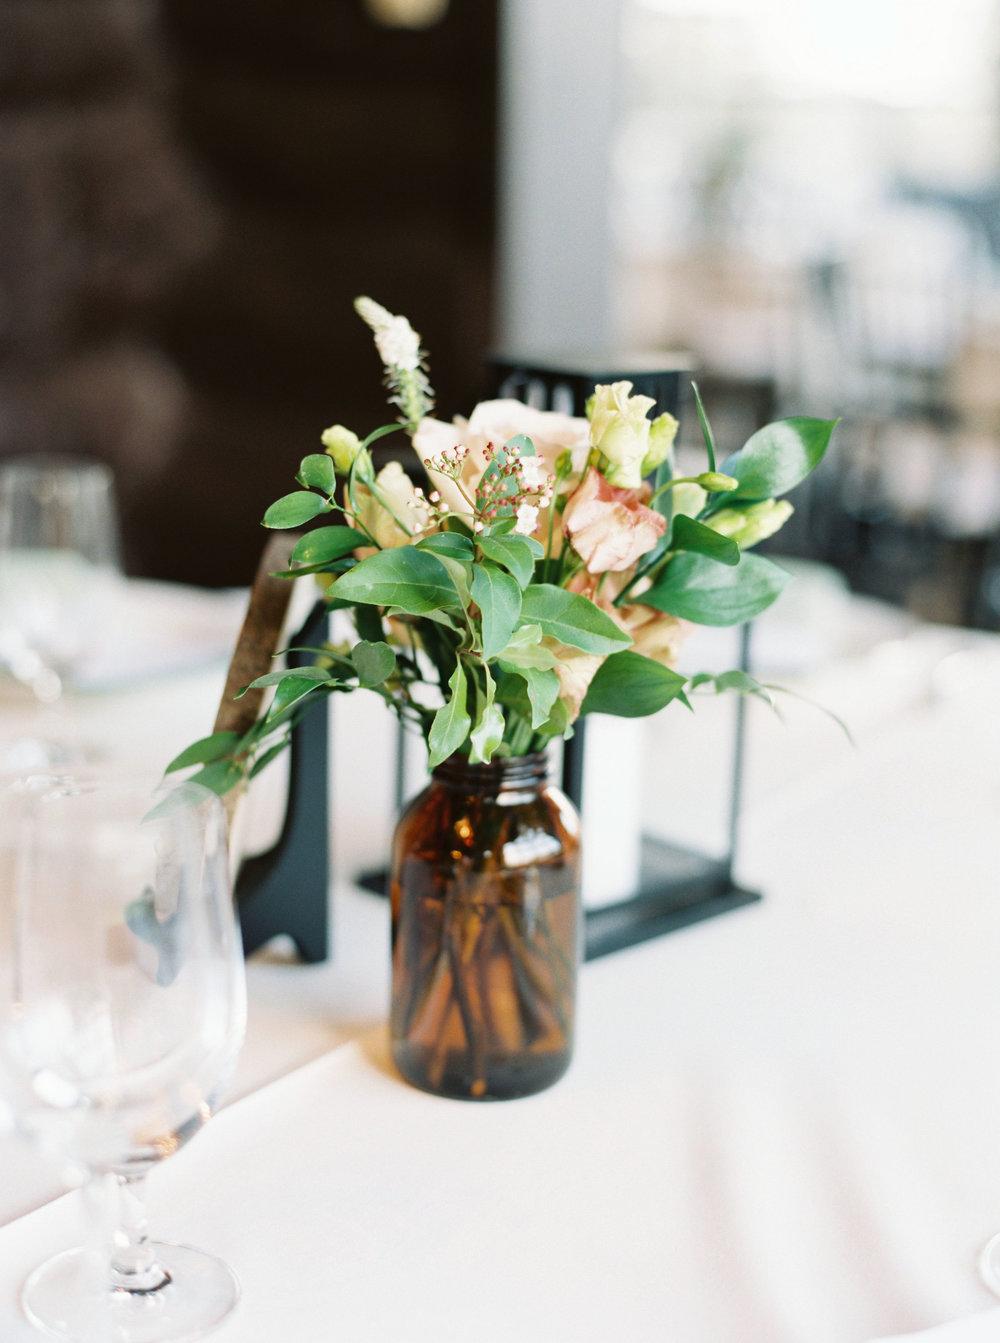 Log-cabin-wedding-in-presidio-san-francisco-california-desintation-wedding-photography-128.jpg